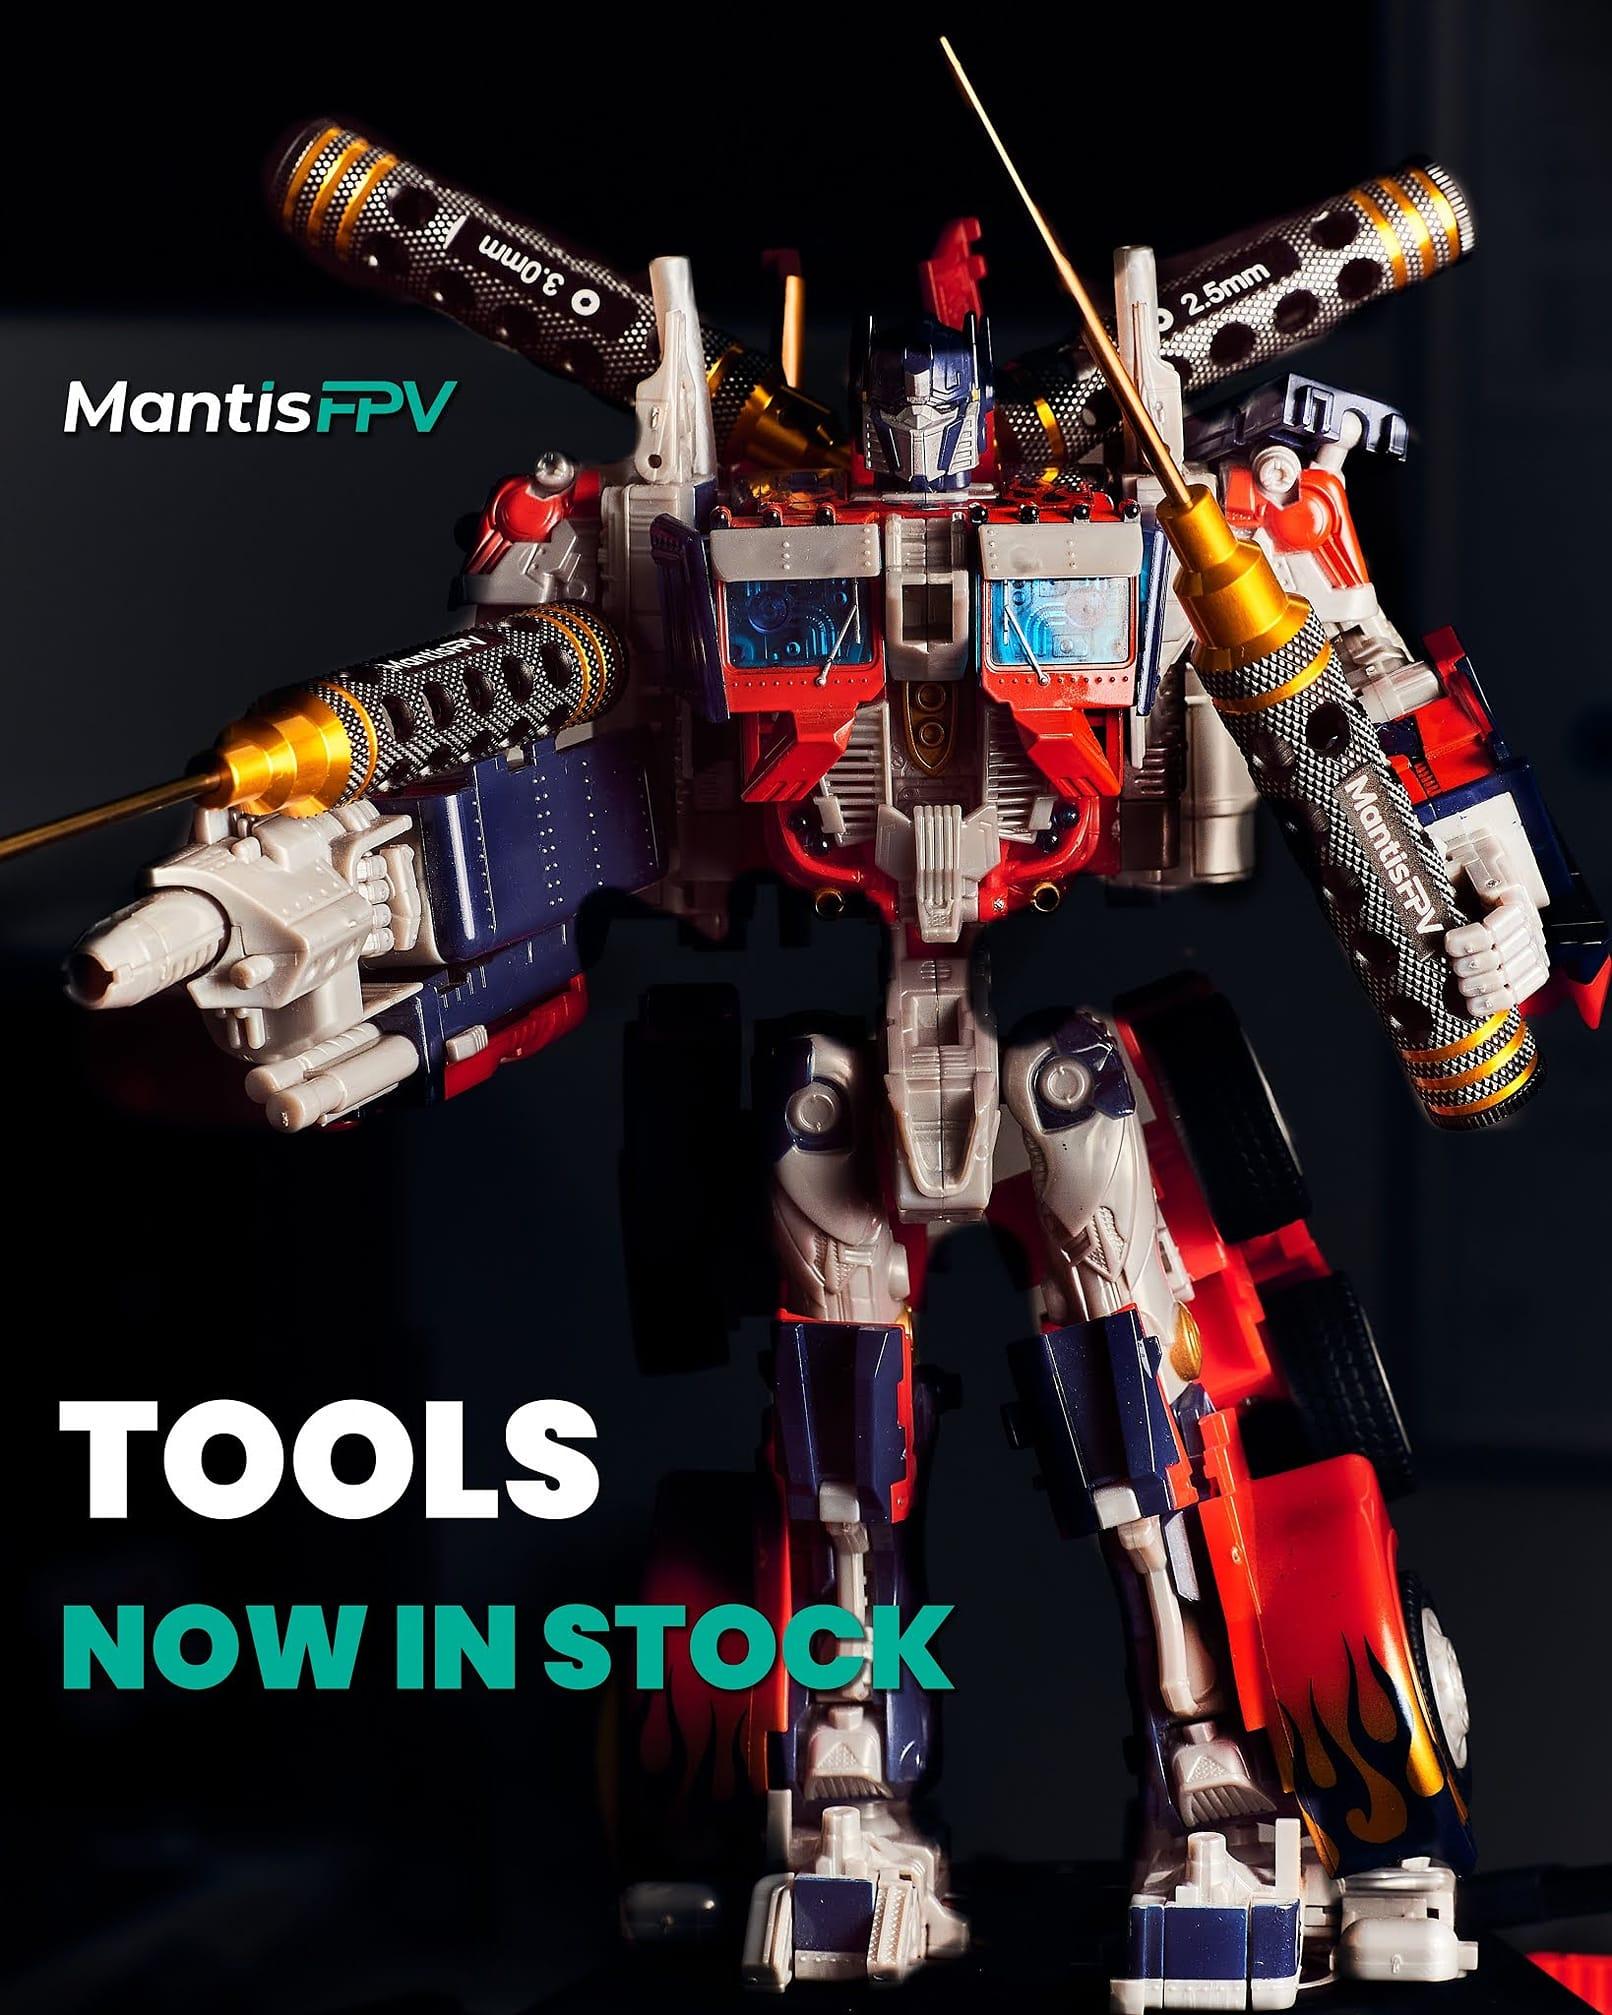 Optimus Prime as a model for MantisFPV